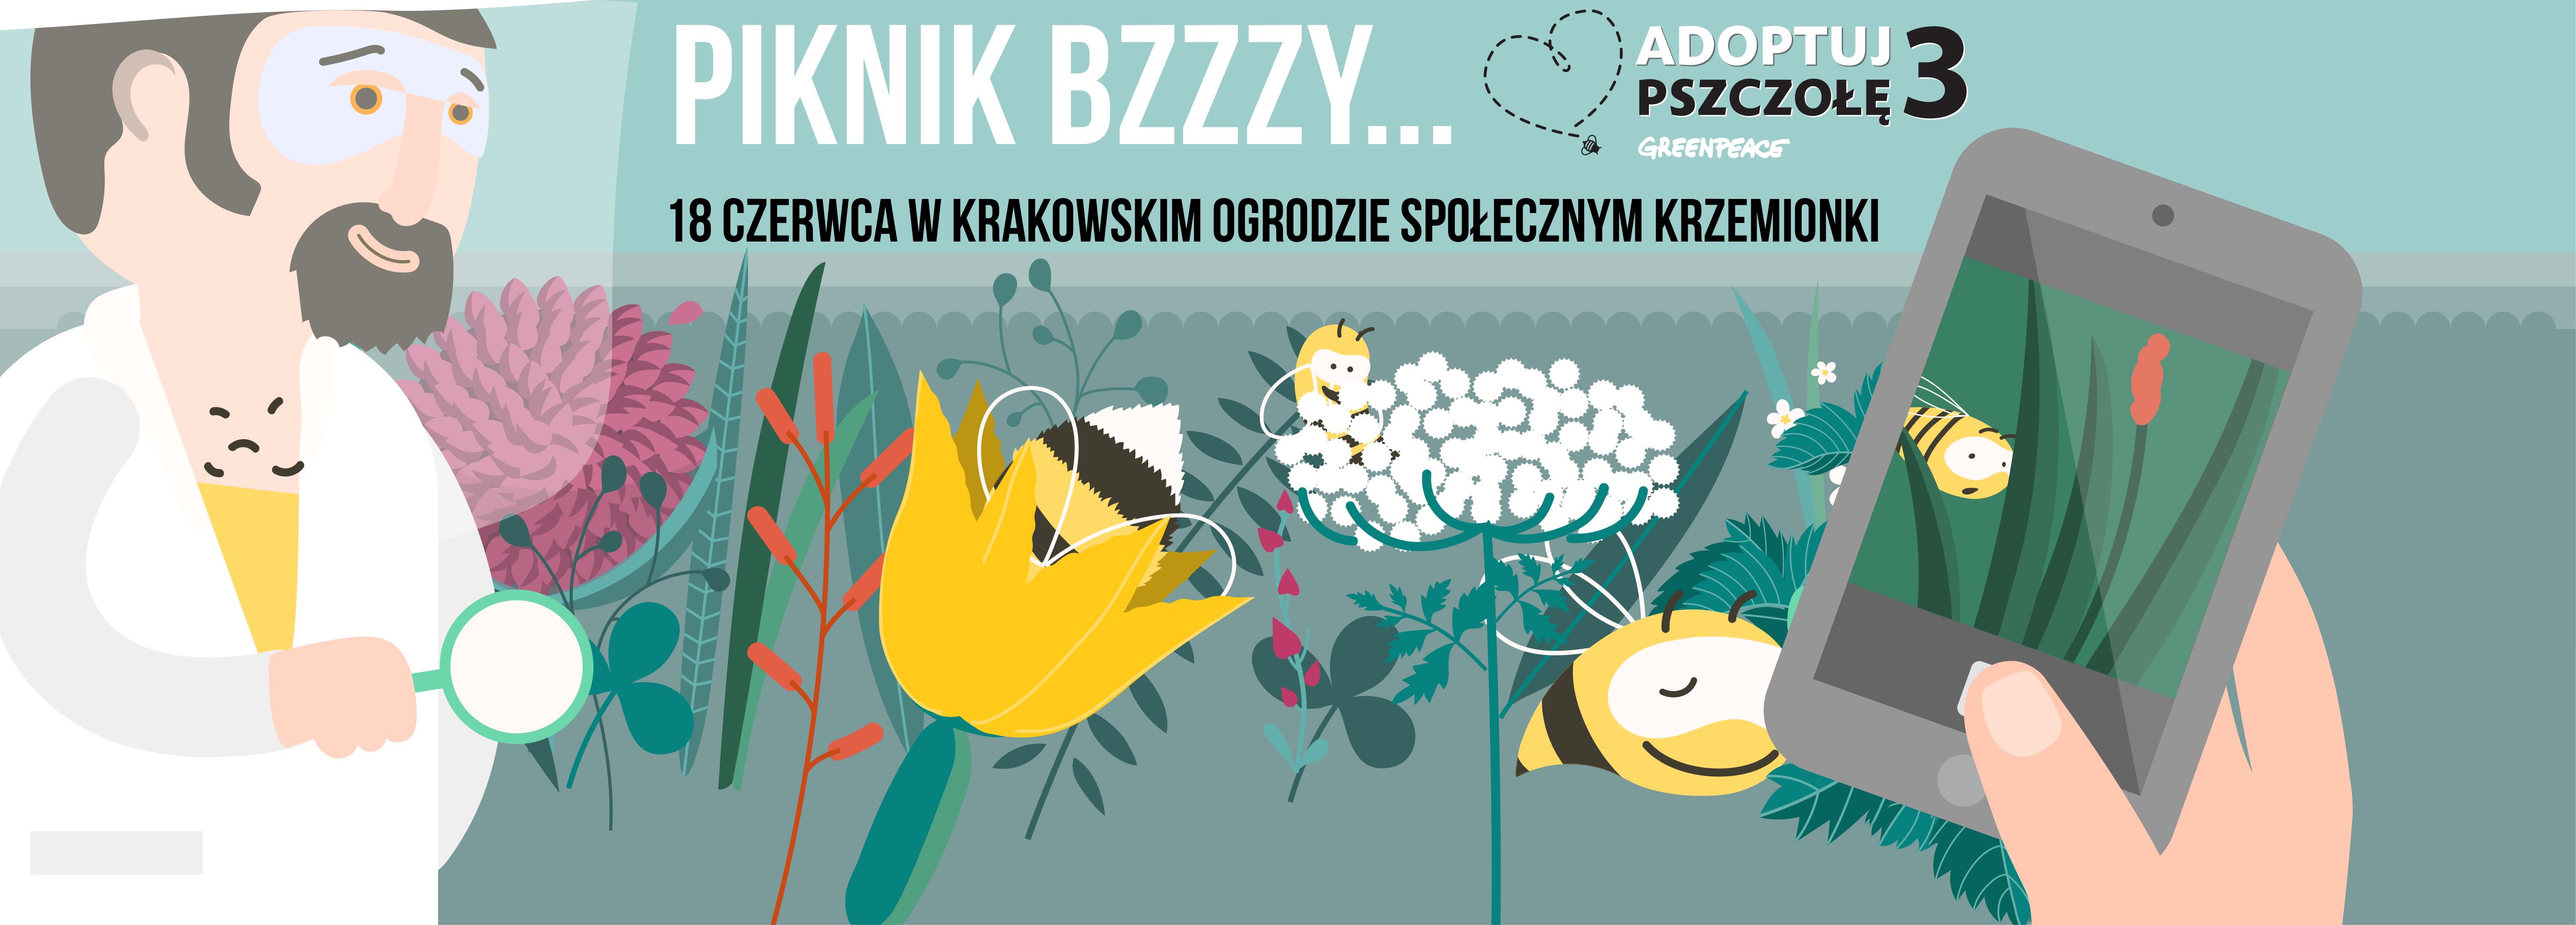 piknik krakow